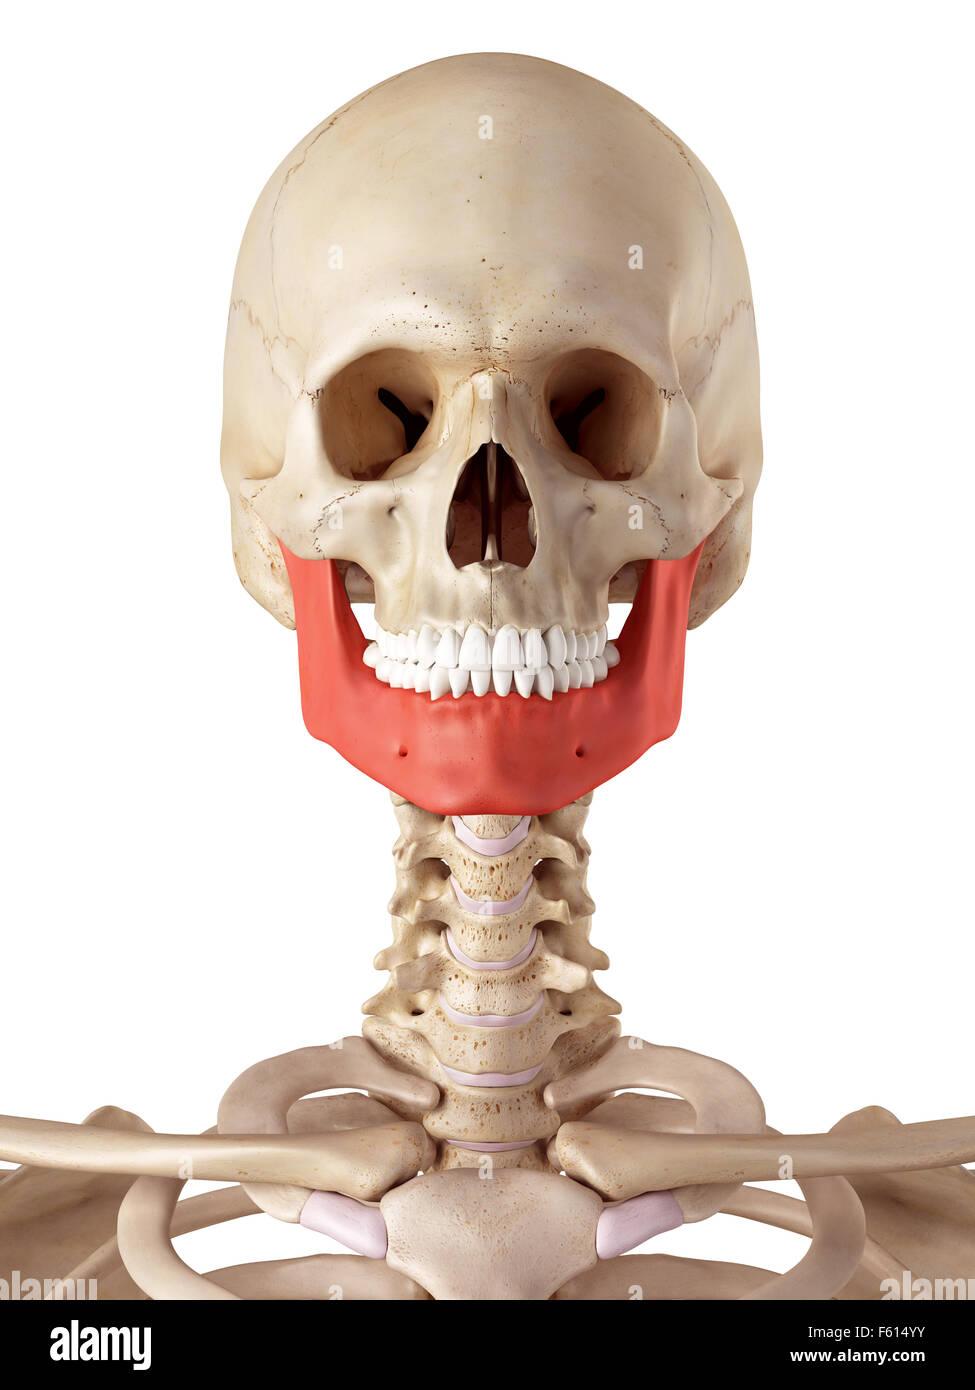 Jaw Bone Stock Photos Jaw Bone Stock Images Alamy